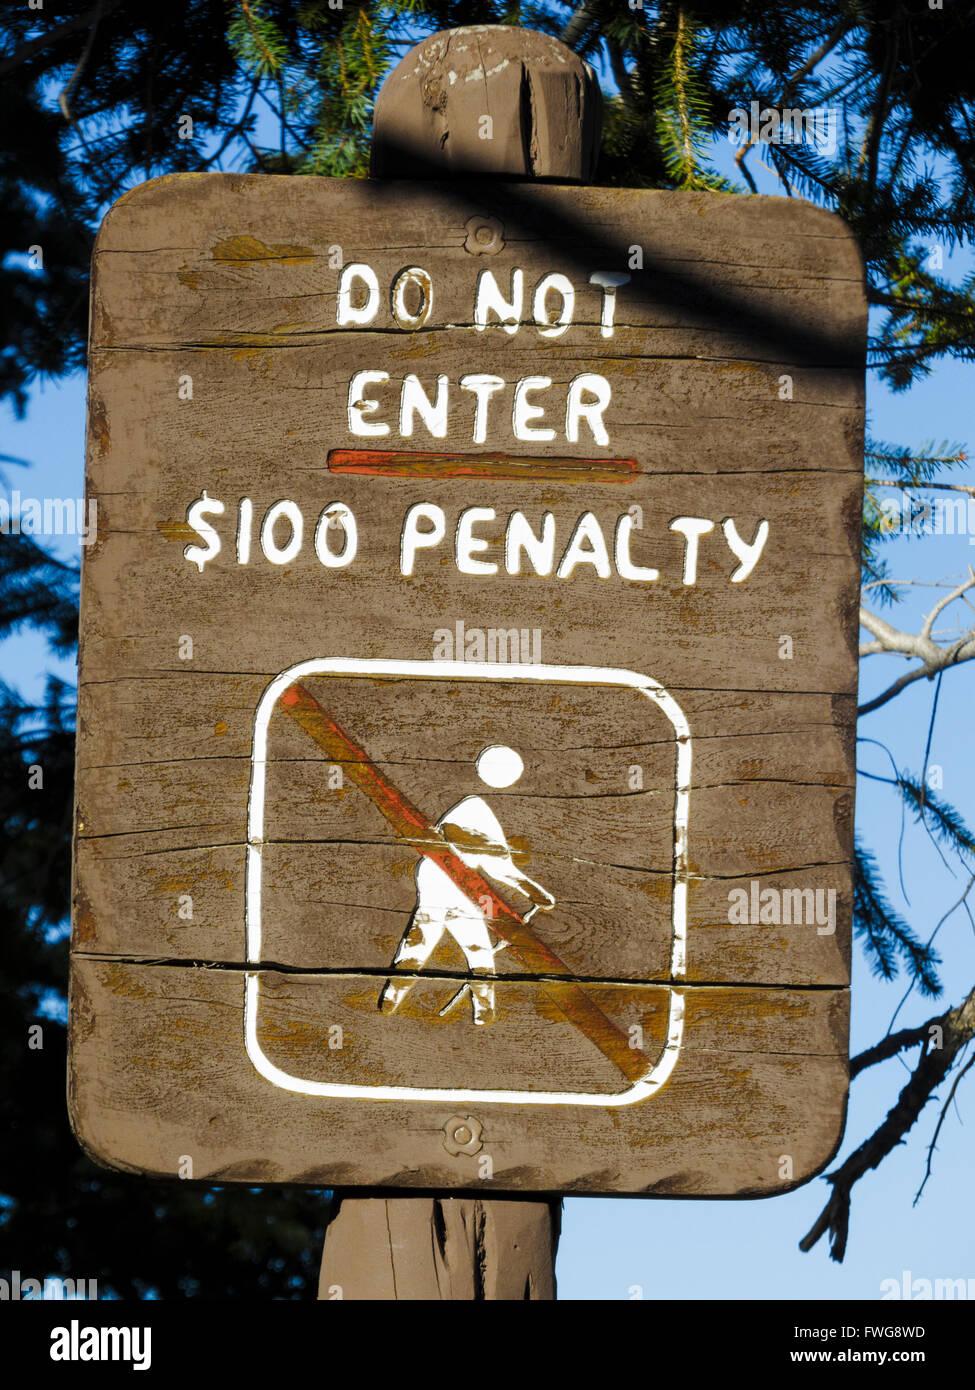 Sign 'Do Not Enter, $100 Penalty' at Bryce Canyon National Park, Utah, USA. - Stock Image